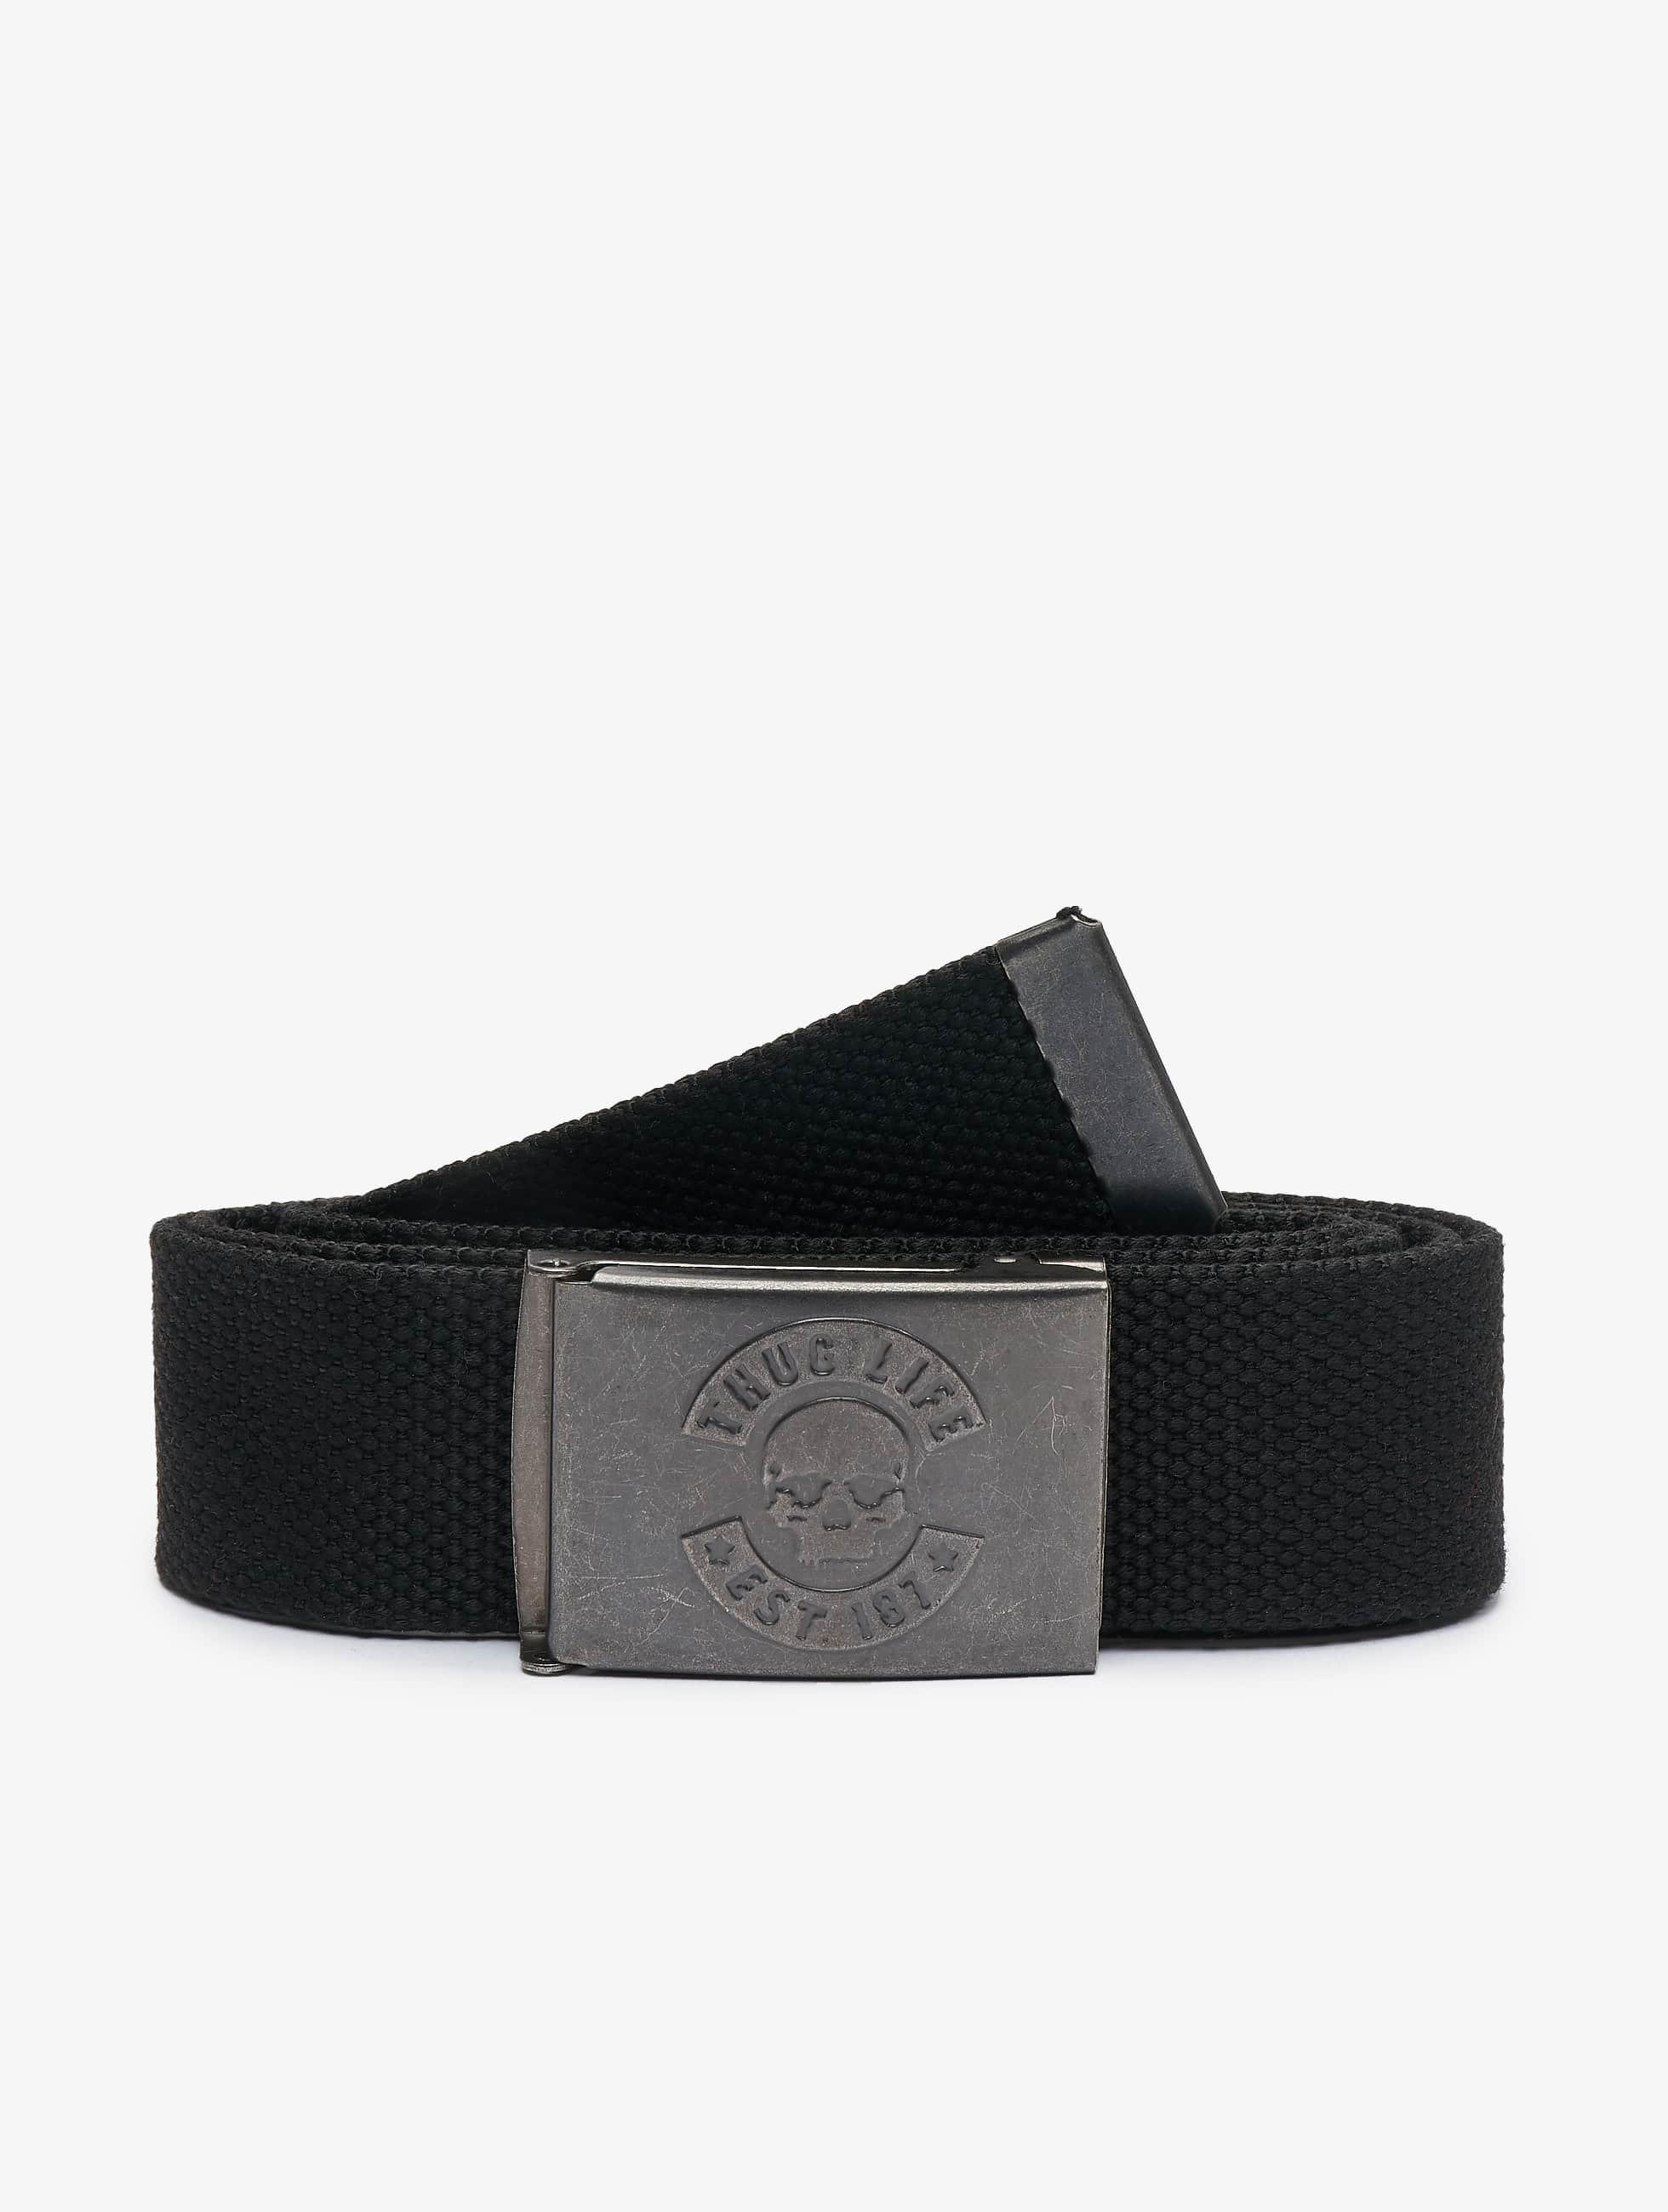 Thug Life / Belt I am Street in black Adjustable